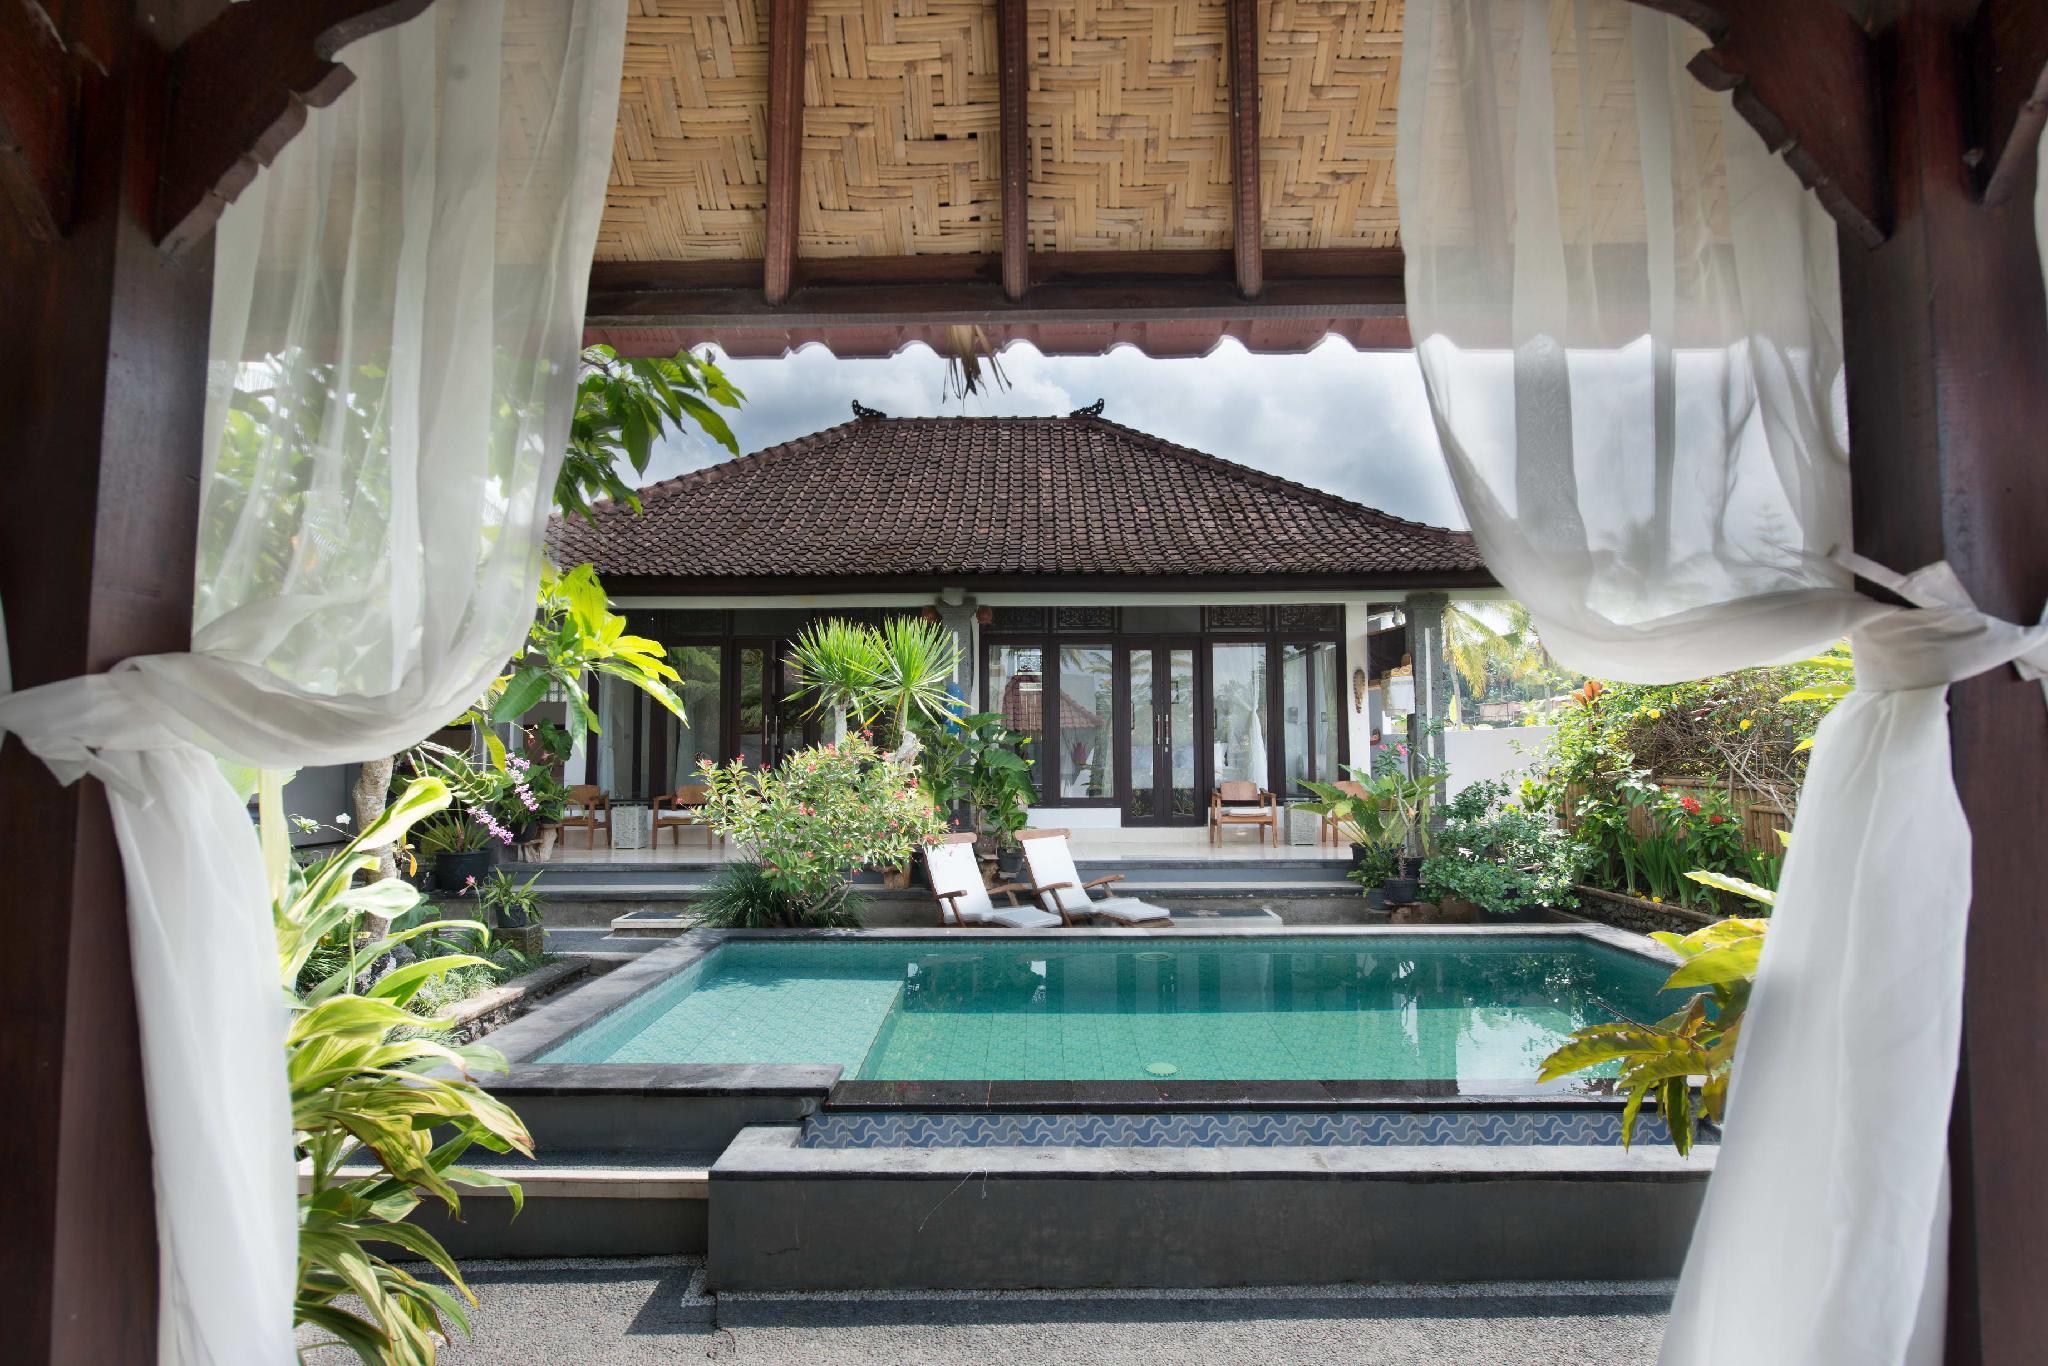 Review Pondok Anastasia, 2 BR Villa with Private Pool